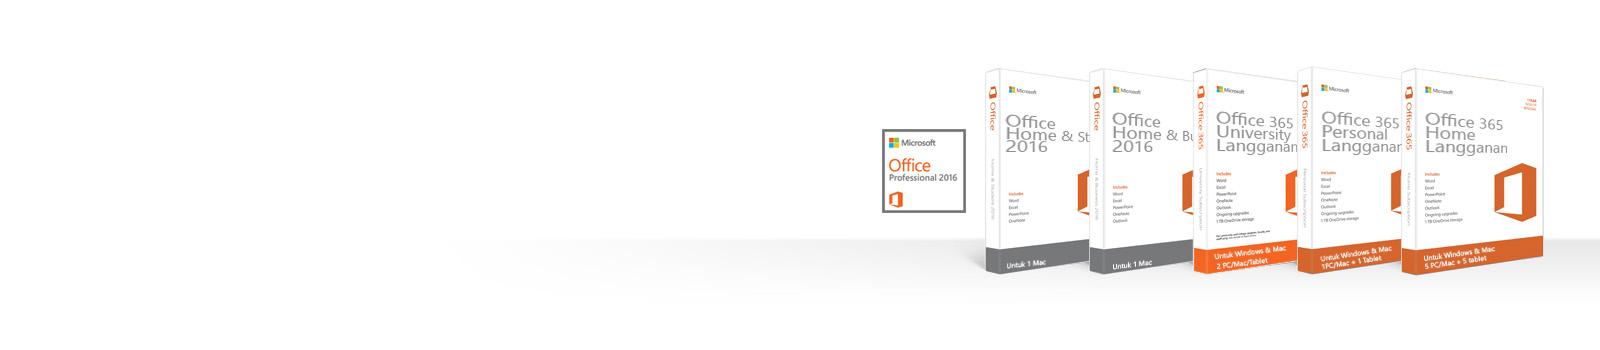 Mengelola, mengunduh, mencadangkan, atau memulihkan produk Office